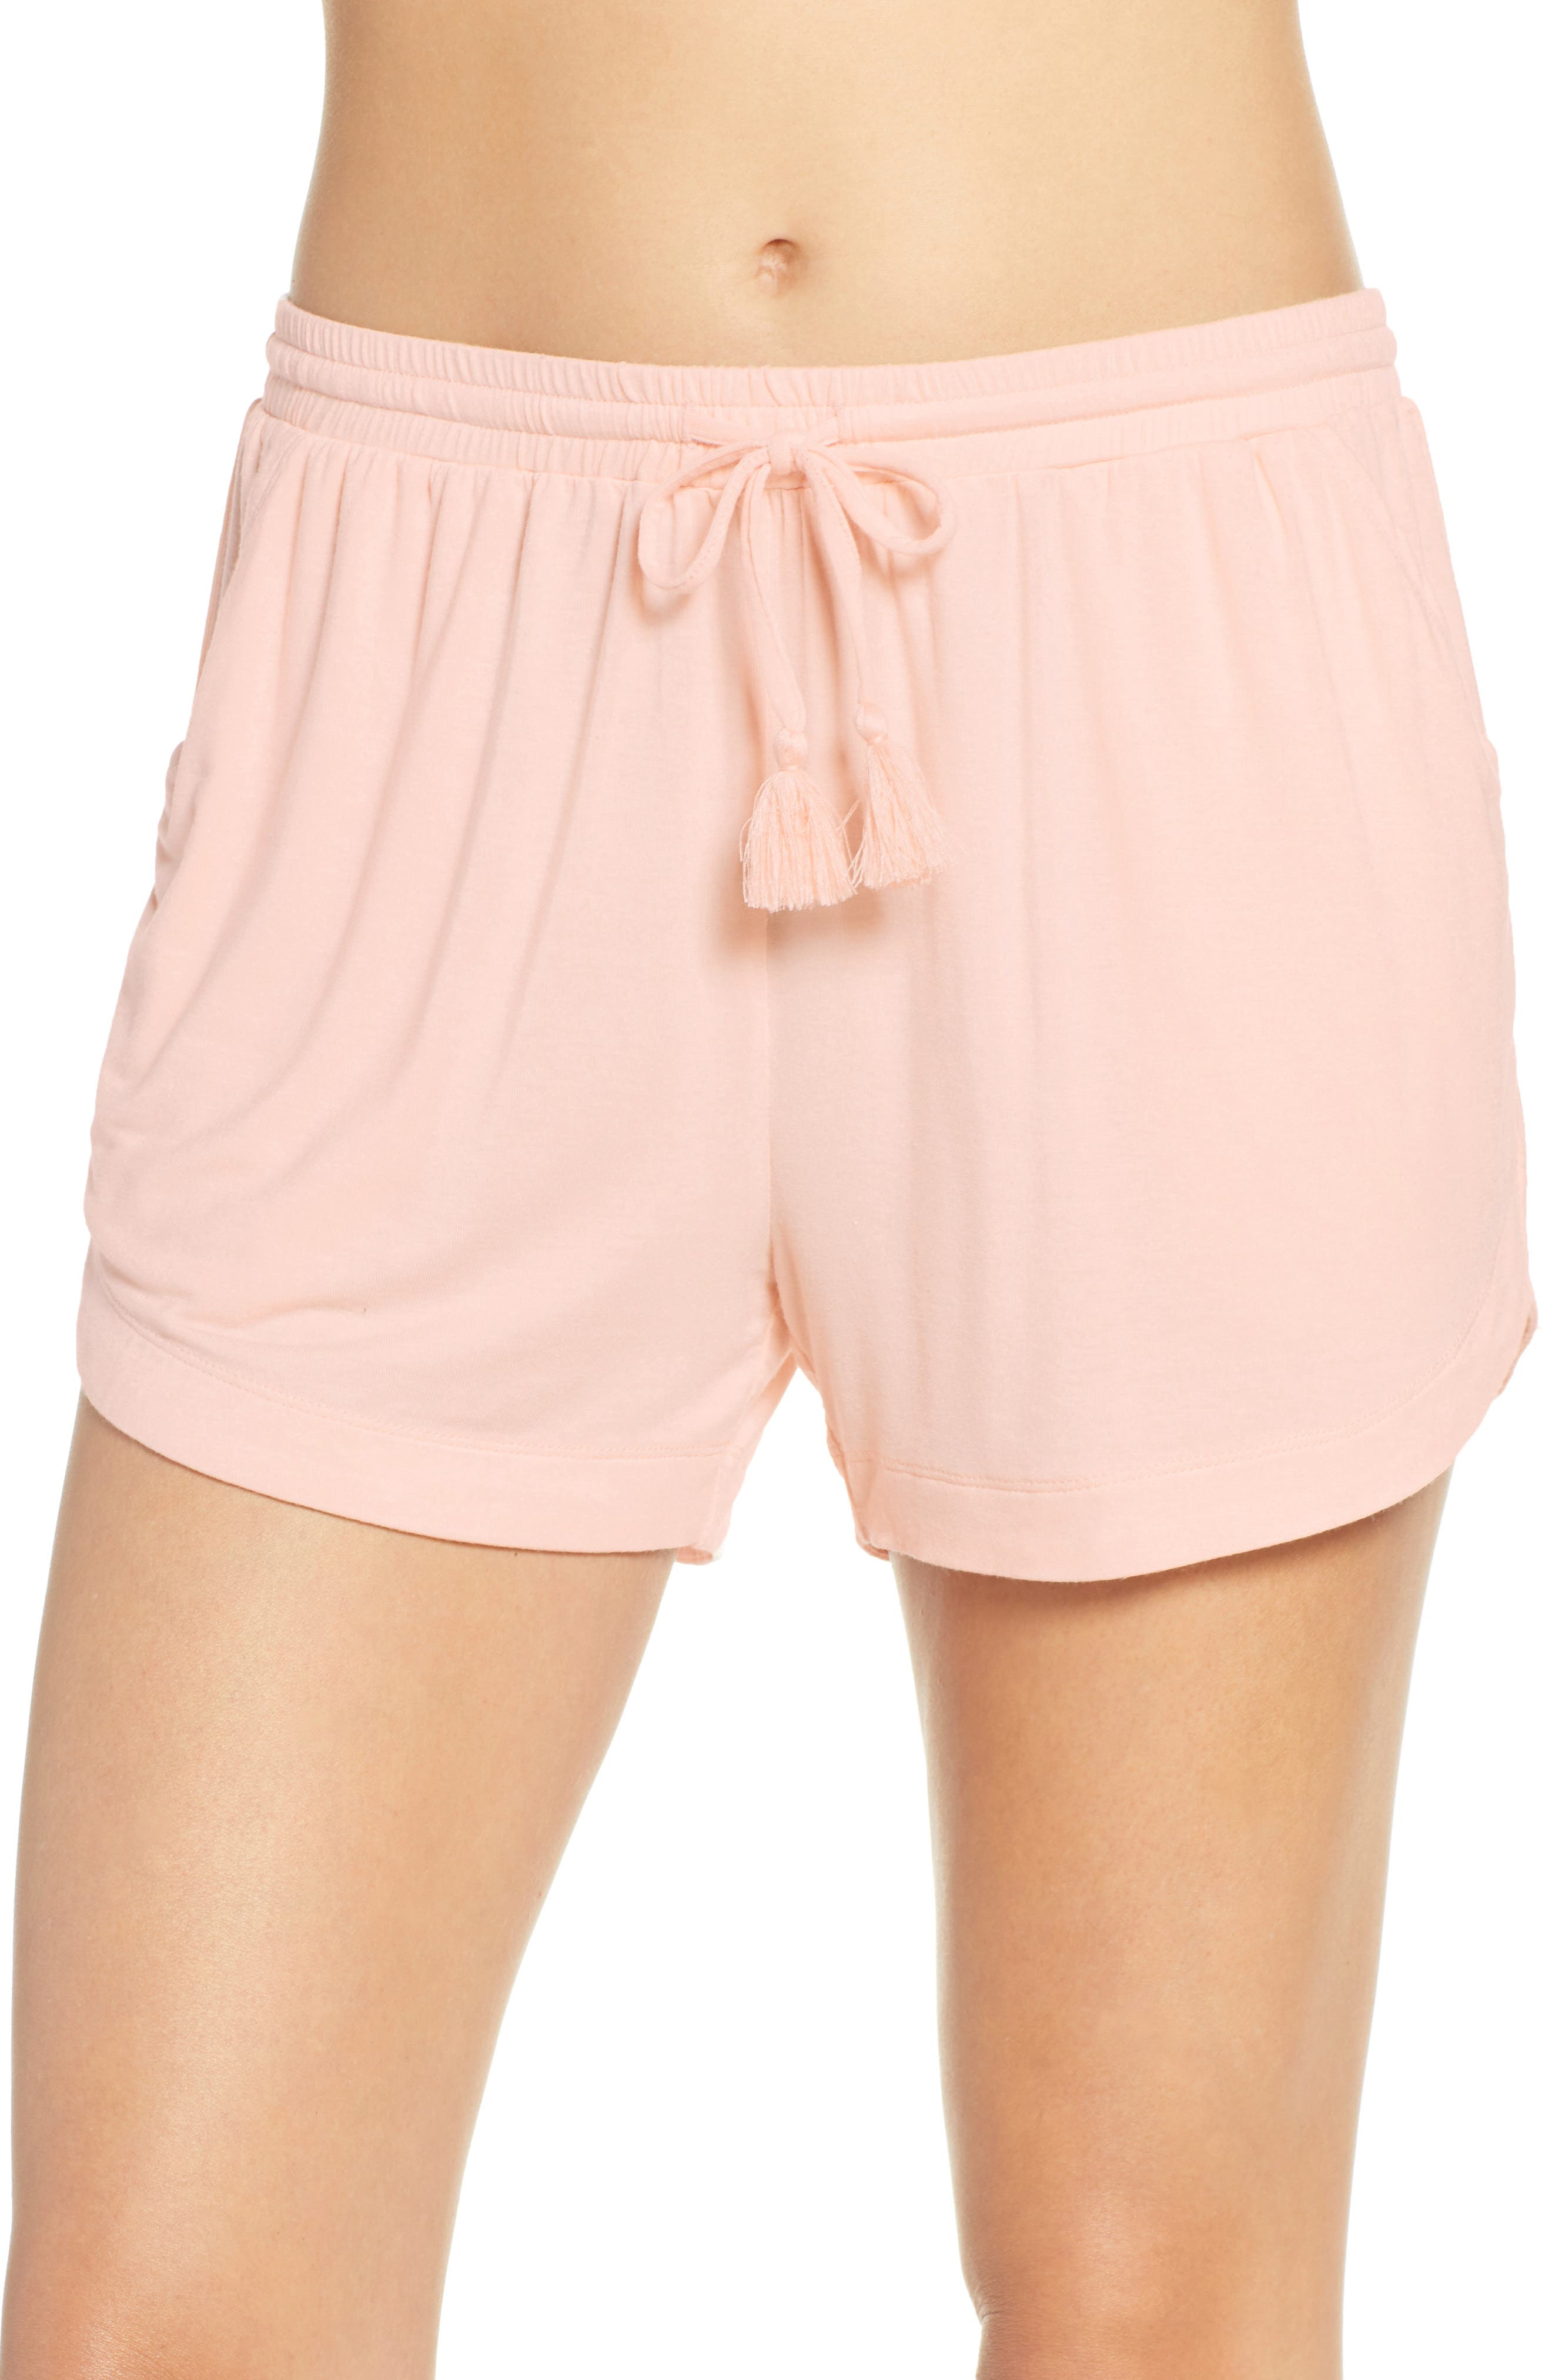 Nordstrom Lingerie Moonlight Pajama Shorts, Pink